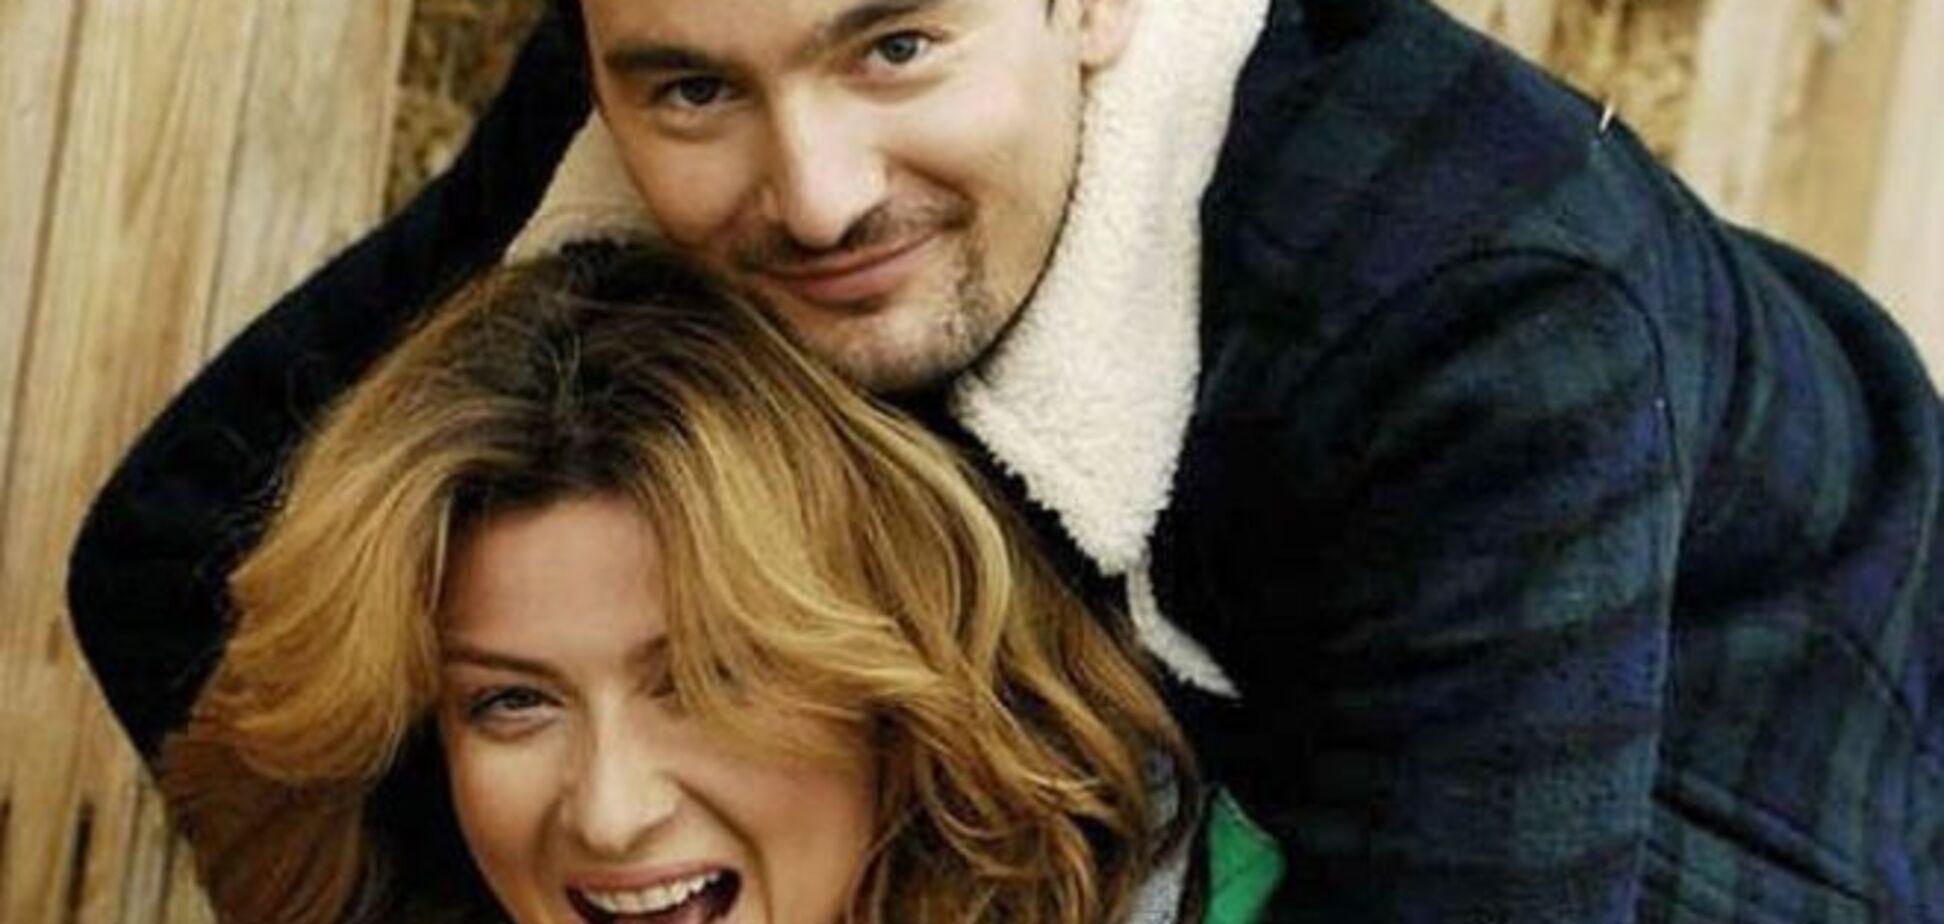 Жанна и Алан Бадоевы: красивая пара воссоединилась